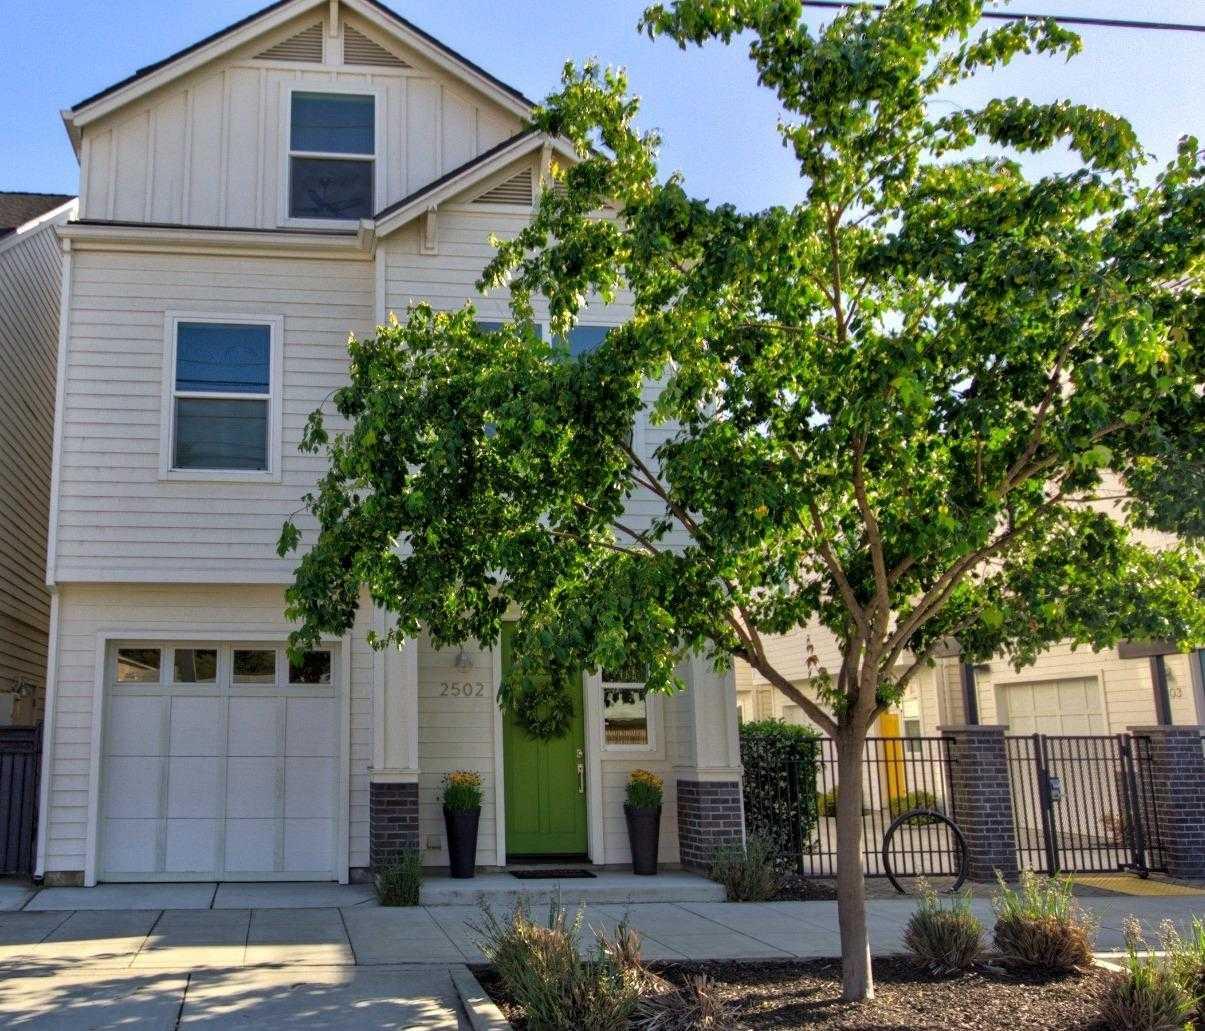 $587,500 - 3Br/3Ba -  for Sale in 2500 R Midtown, Sacramento